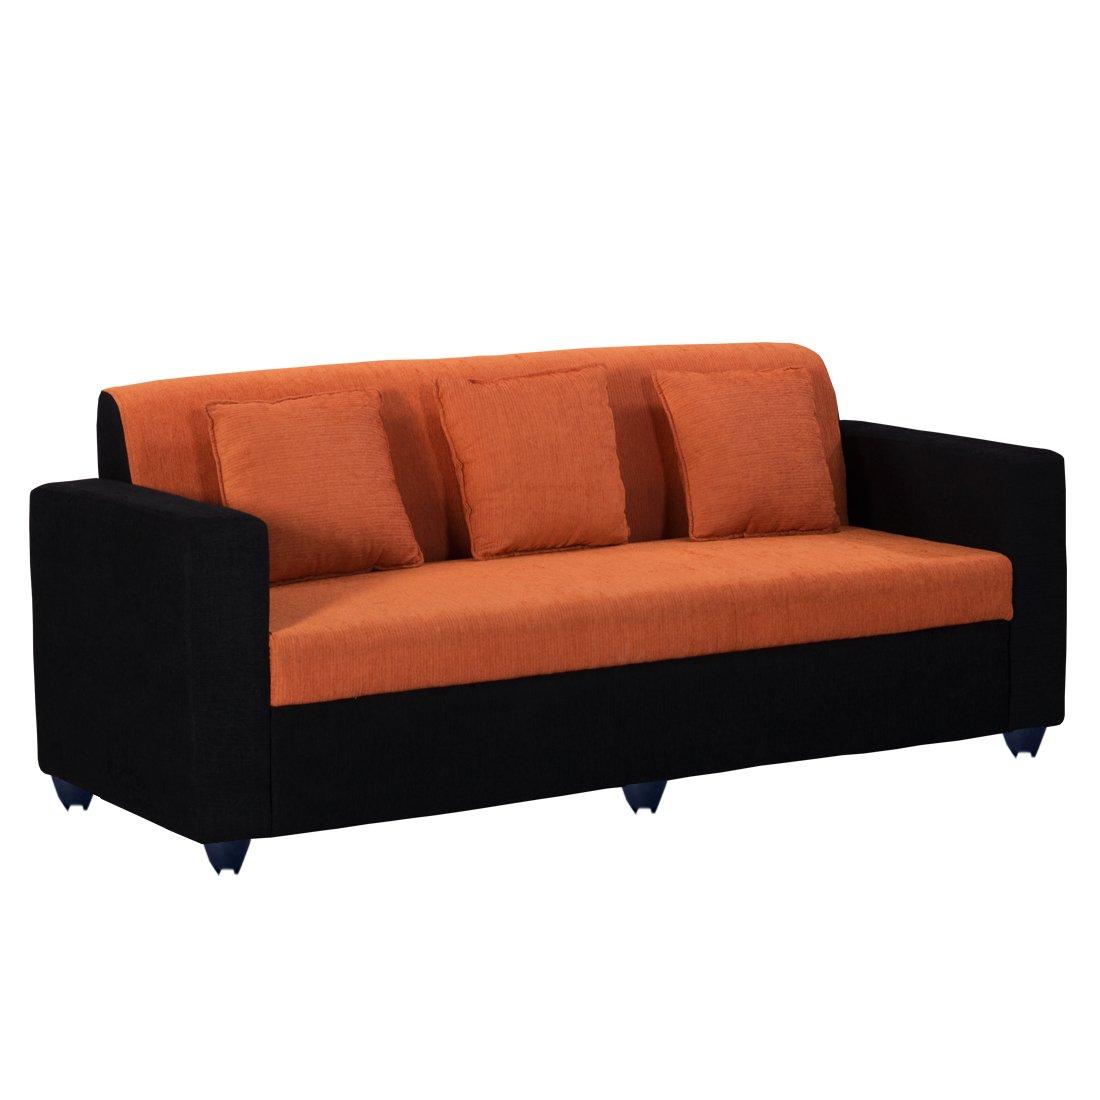 Bharat Lifestyle Desy Fabric 3 Seater Sofa Color Orange Online